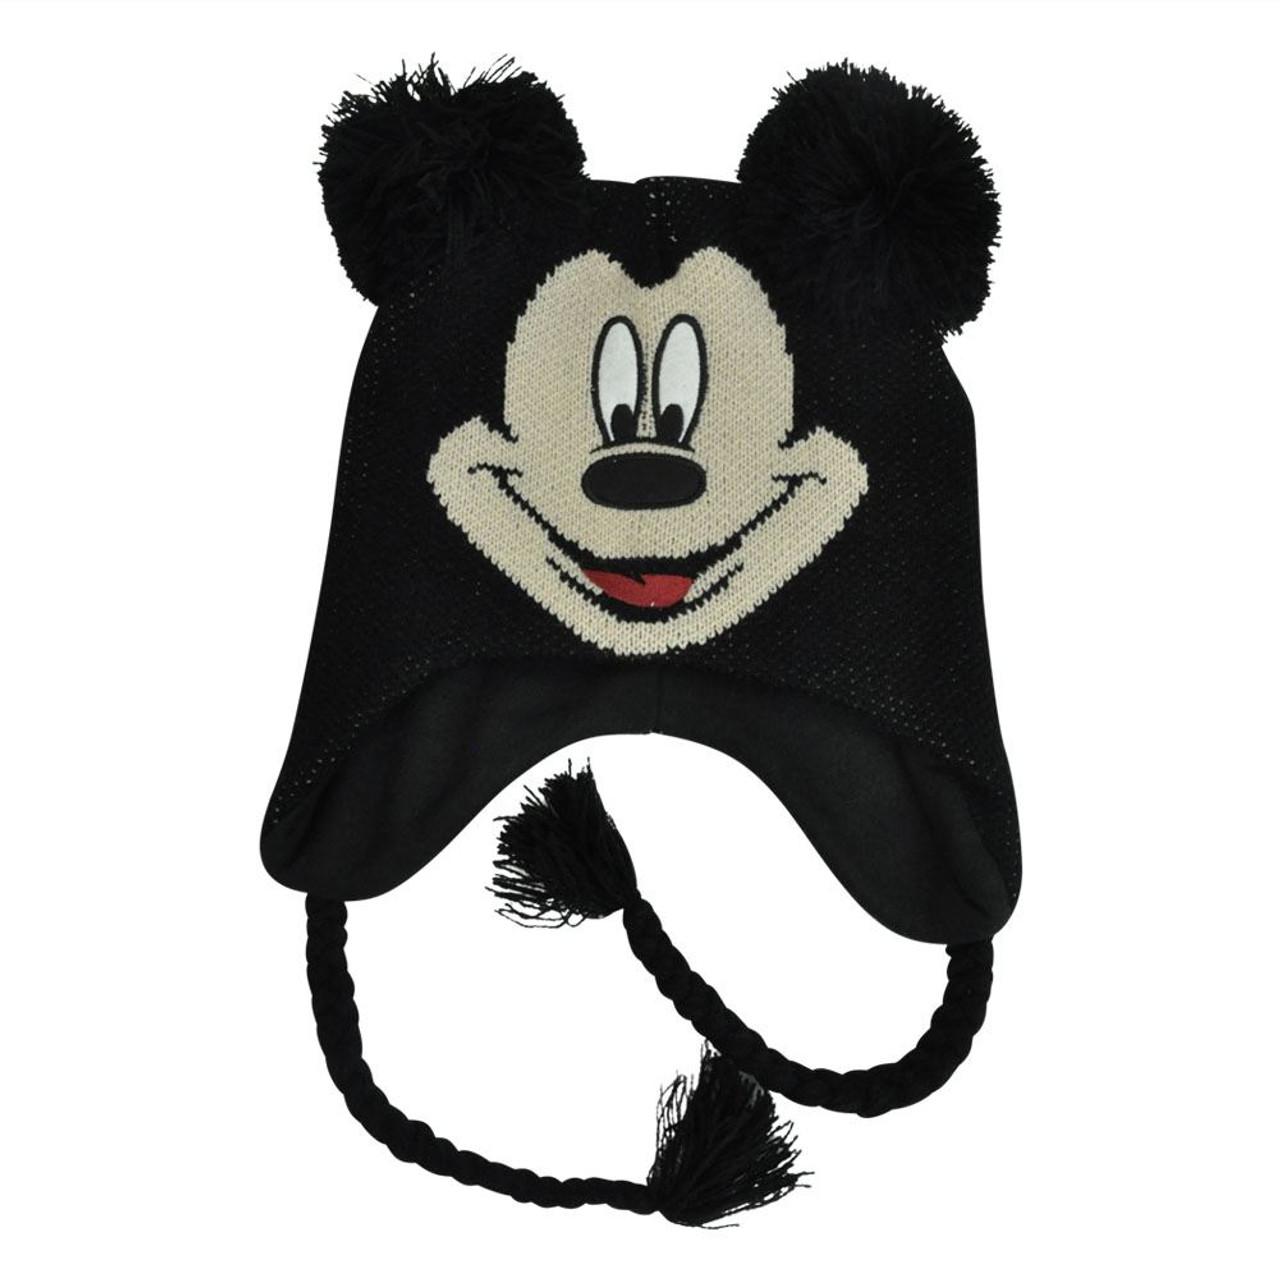 1a59560a8d9 Disney Mickey Mouse Youth Pom Pom Laplander Ear Flap Fleece Beanie Peruvian  Knit - Cap Store Online.com